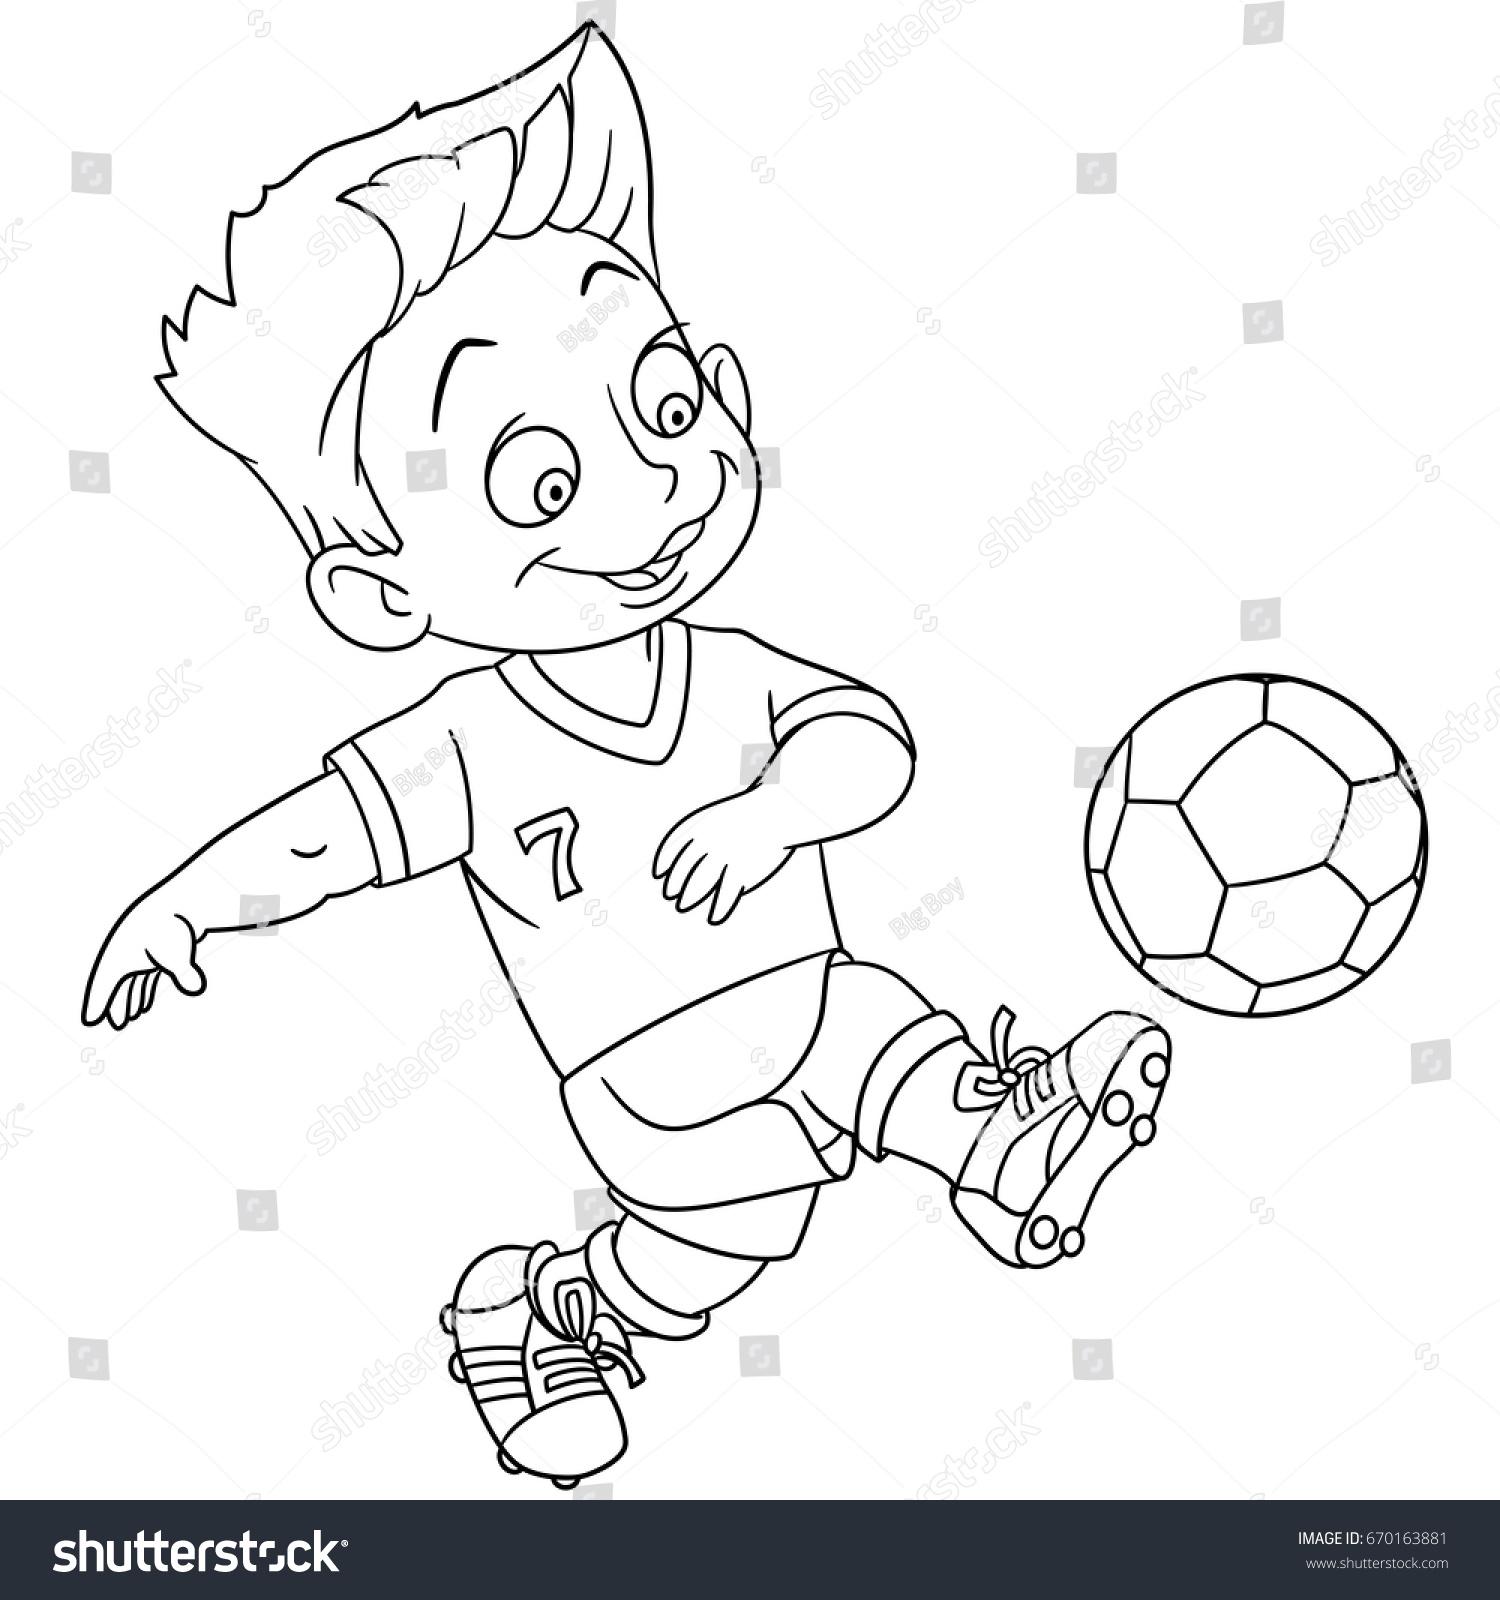 1500x1600 A Boy Playing Football Drawing Coloring Page Cartoon Boy Playing